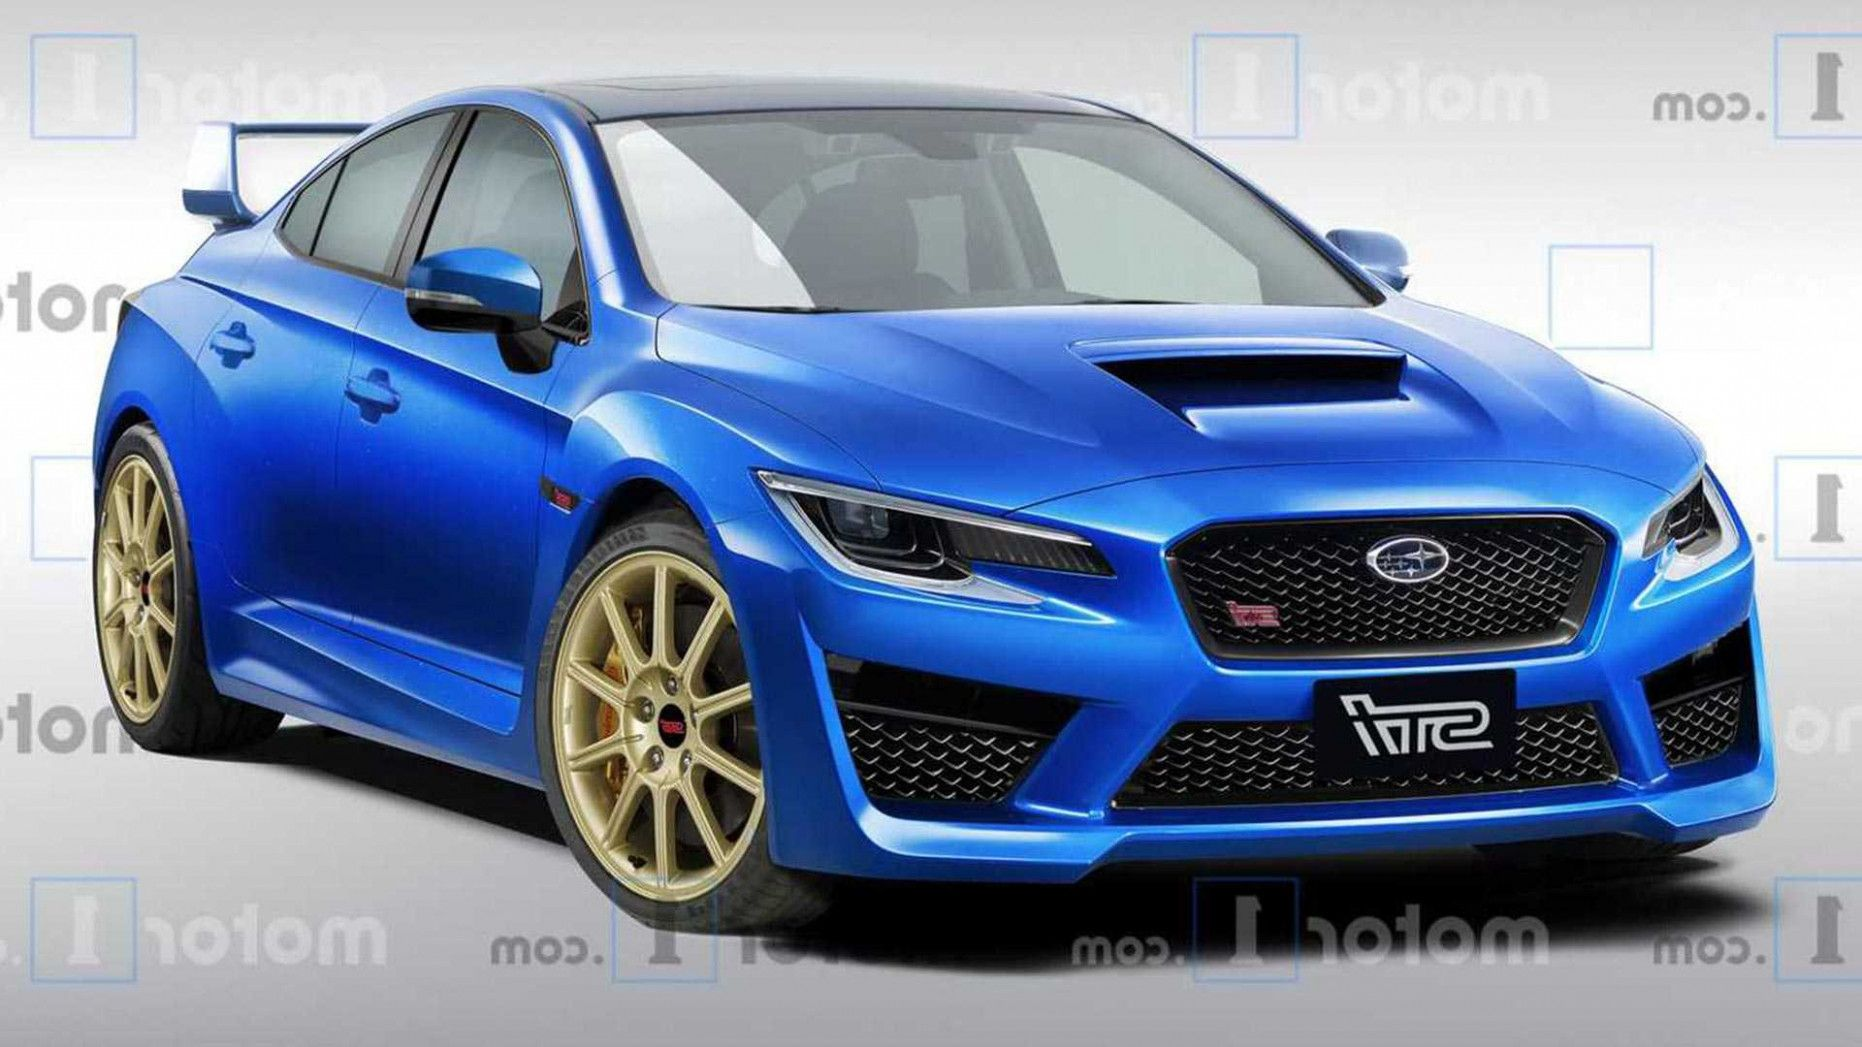 You Should Experience 2020 Subaru Wrx Sti Price At Least Subaru Wrx